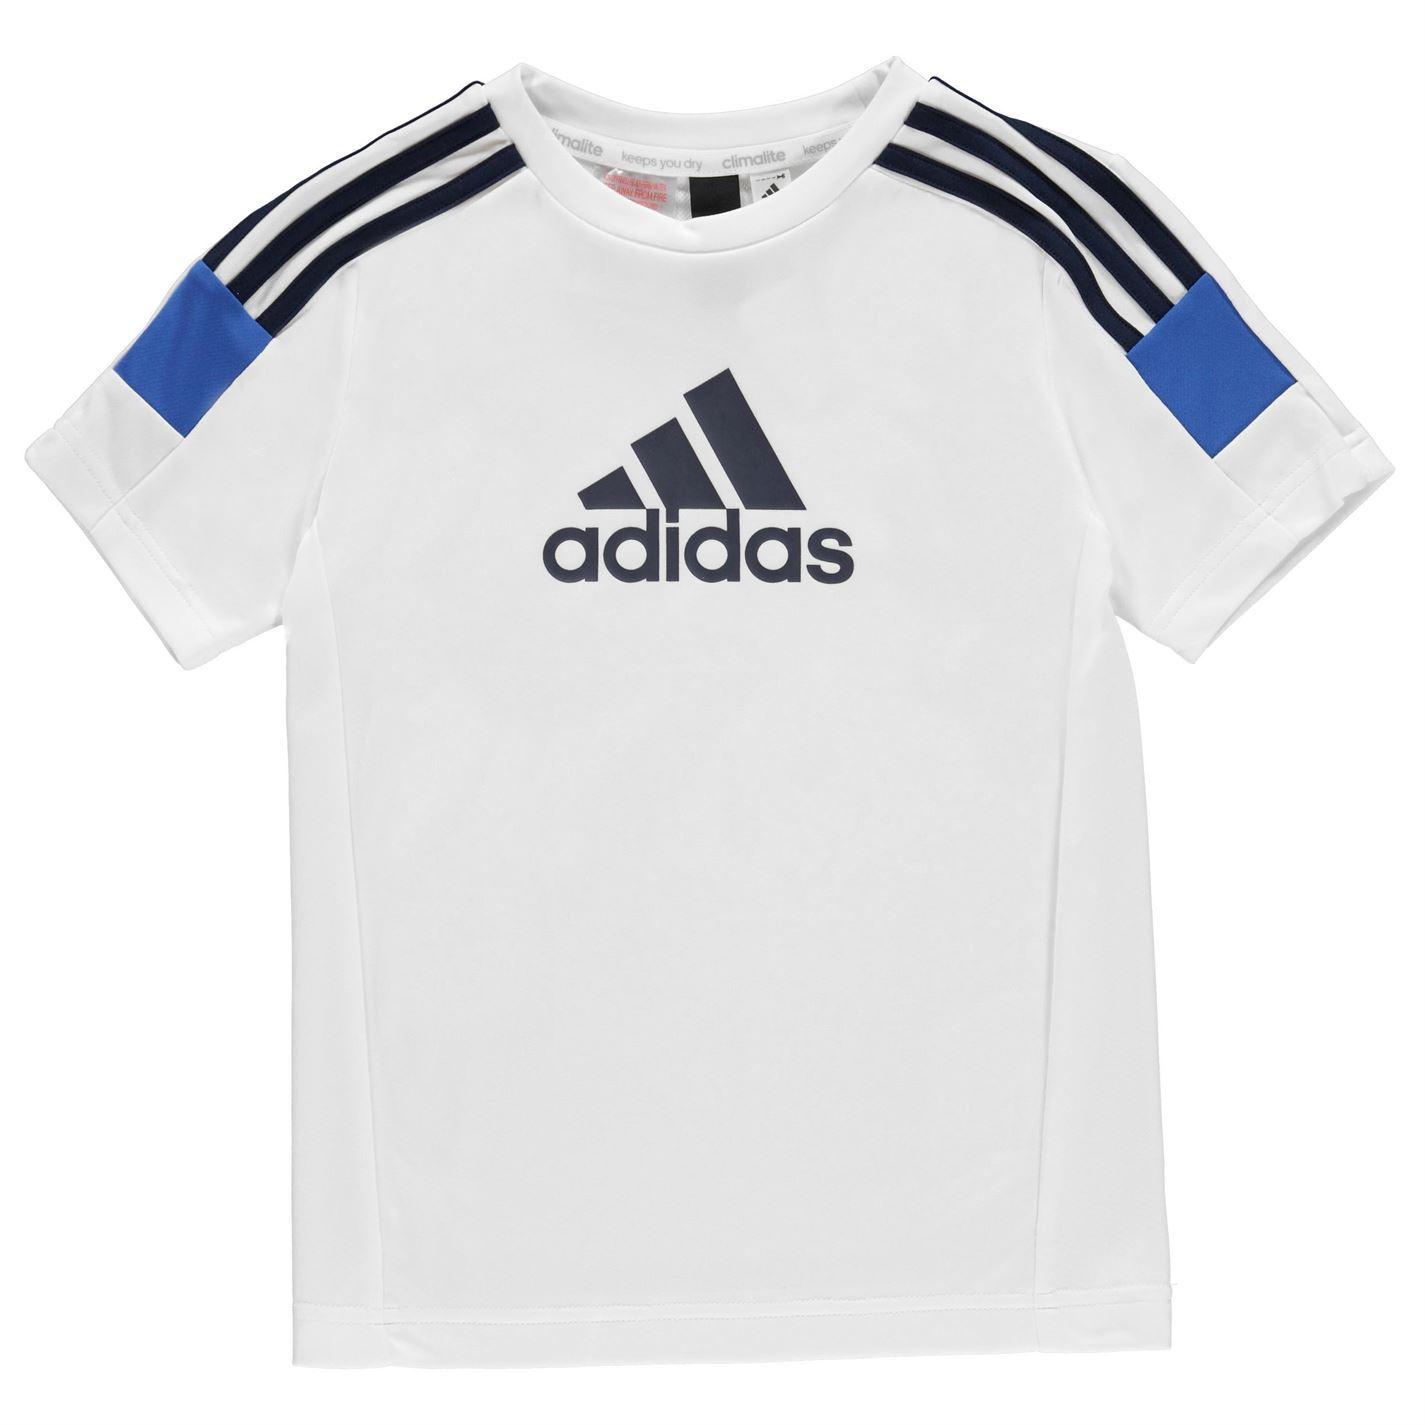 488706c3452 Adidas T Shirt Womens Ebay - DREAMWORKS